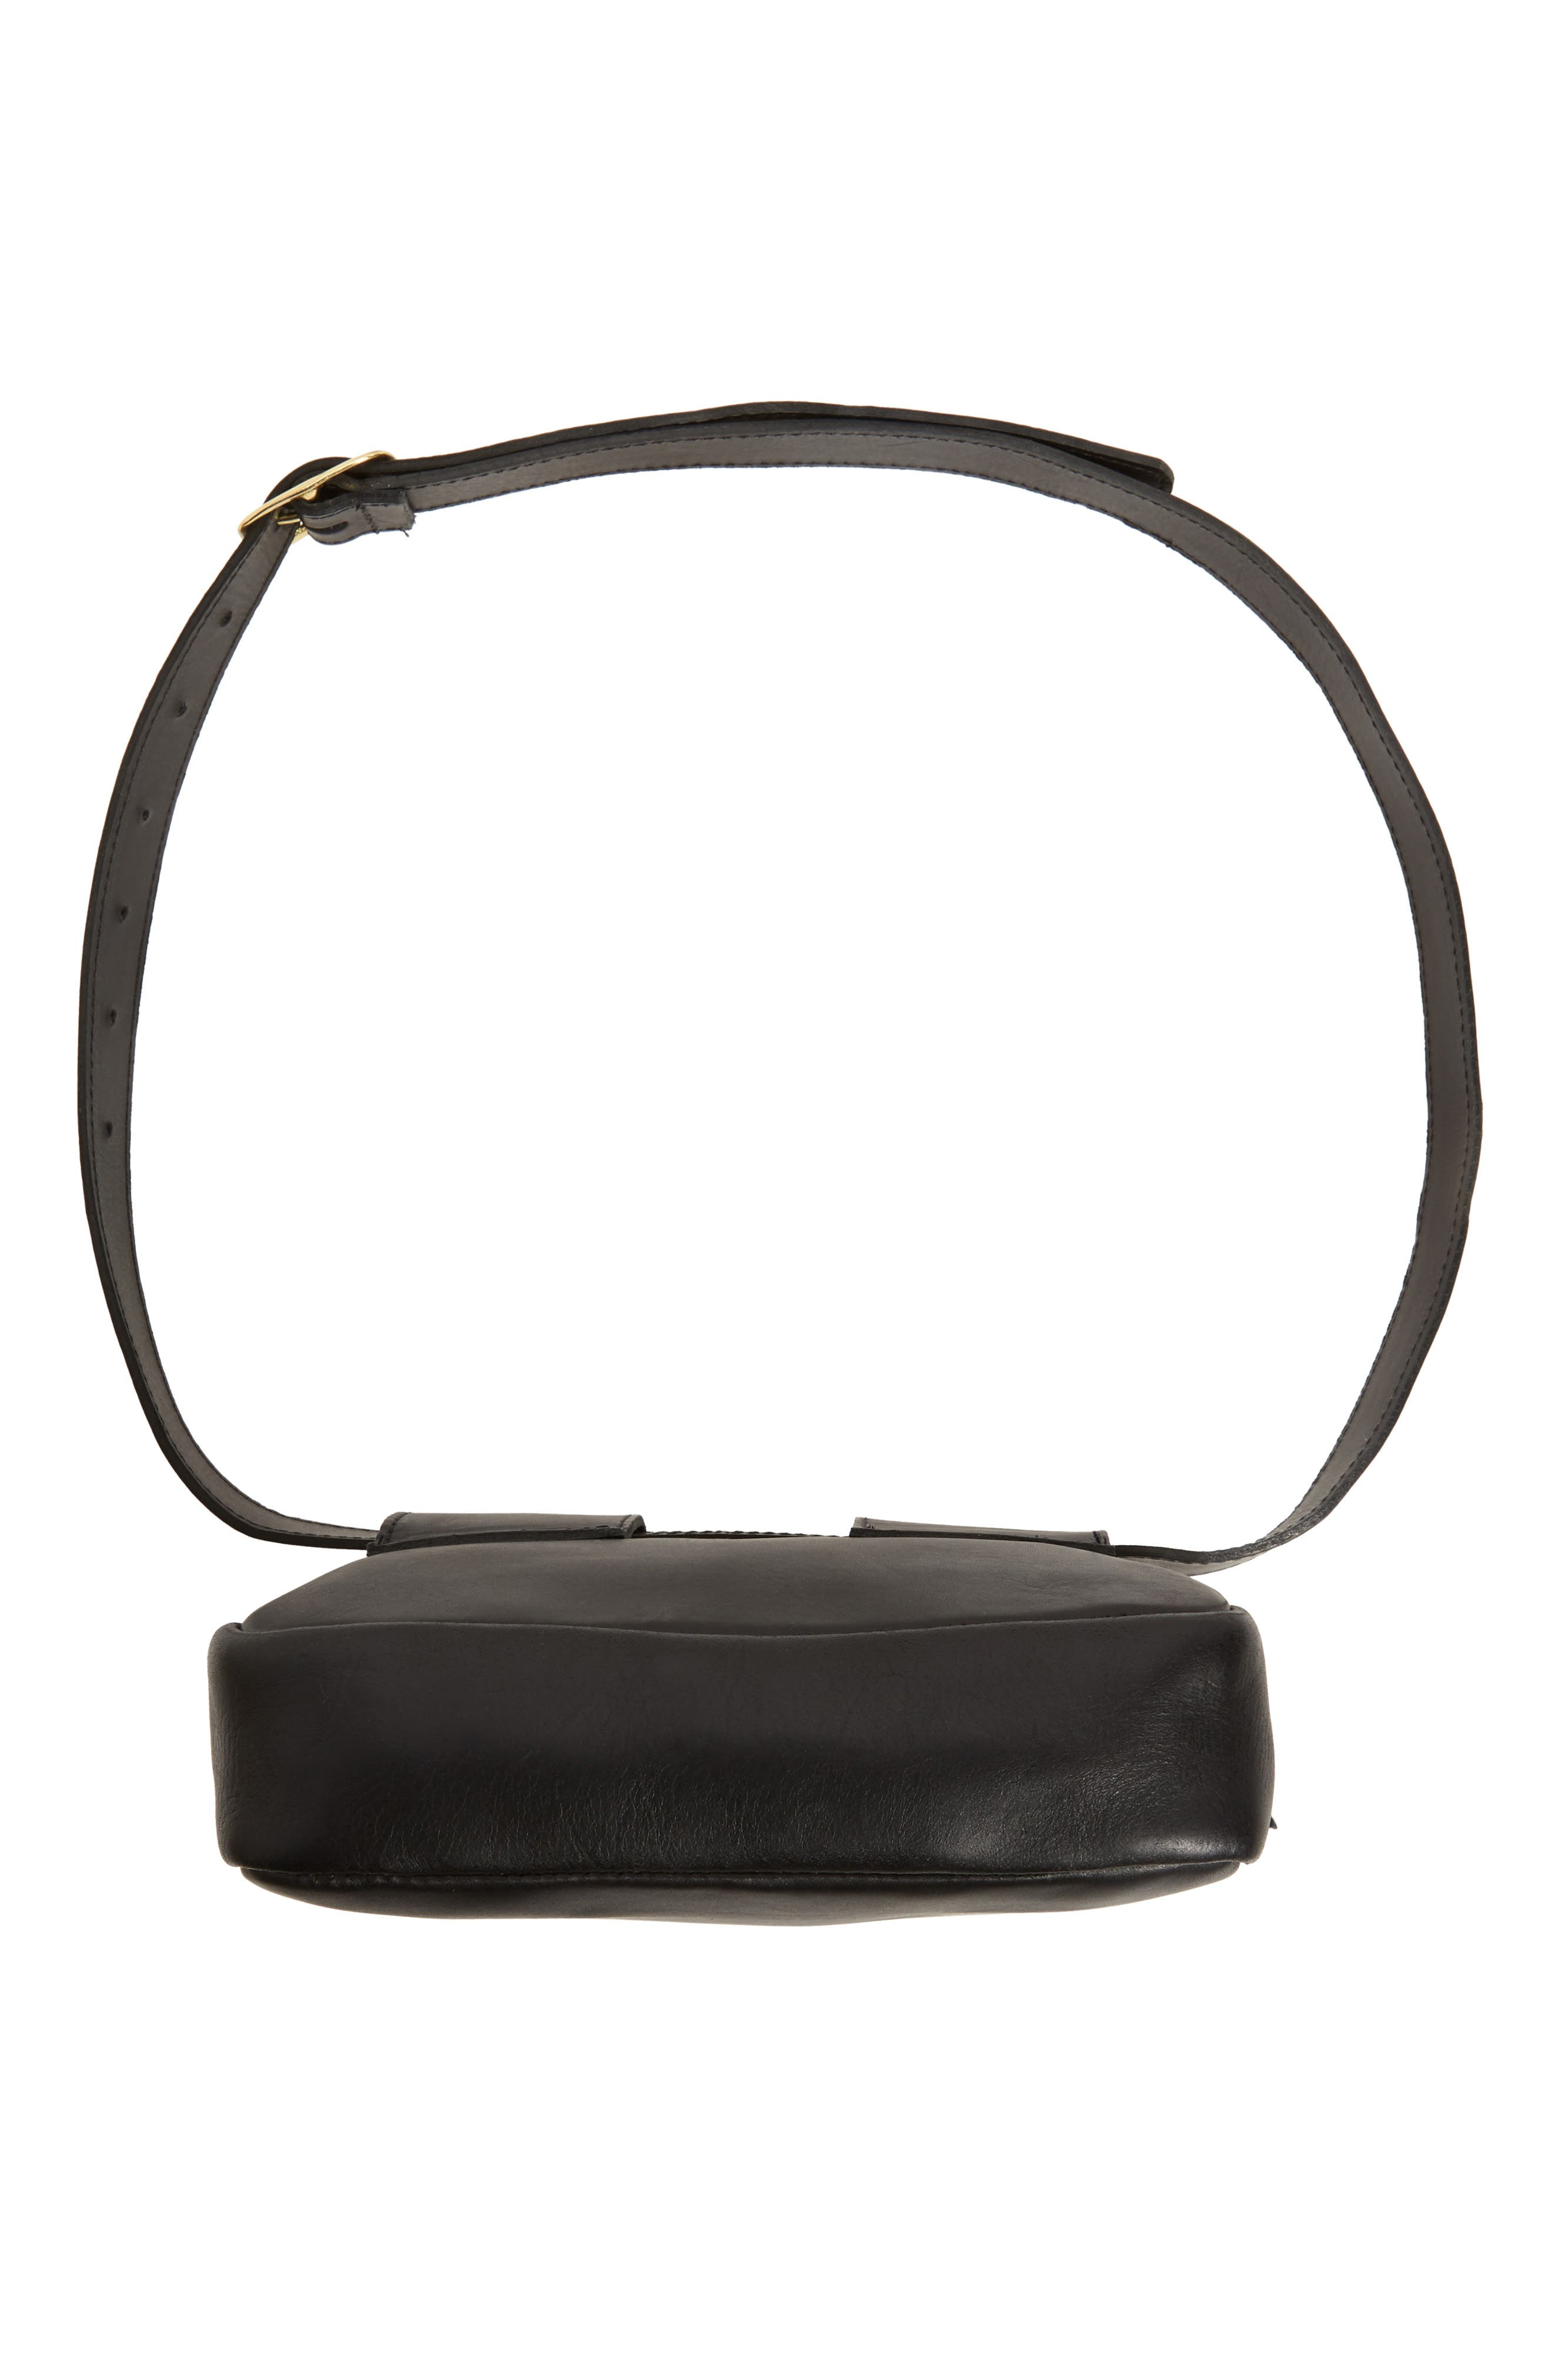 Le Belt Leather Convertible Crossbody Bag,                             Alternate thumbnail 7, color,                             BLACK VEGAN